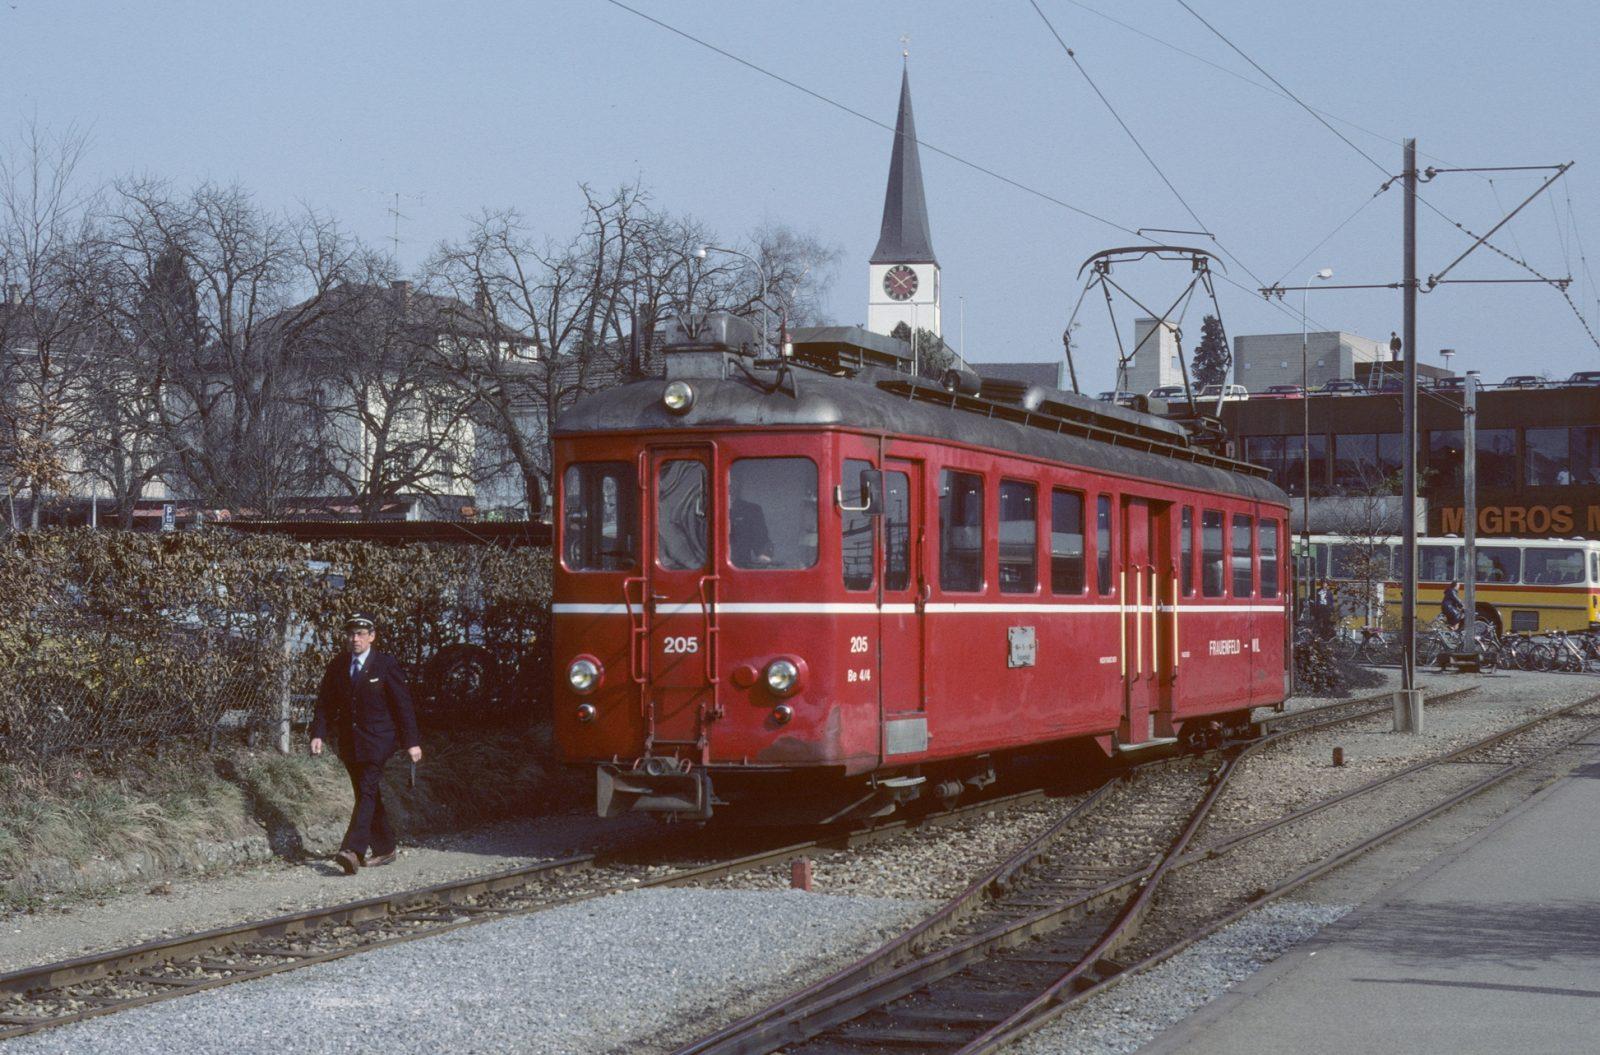 Frauenfeld Wil Bahn alte Station Wil